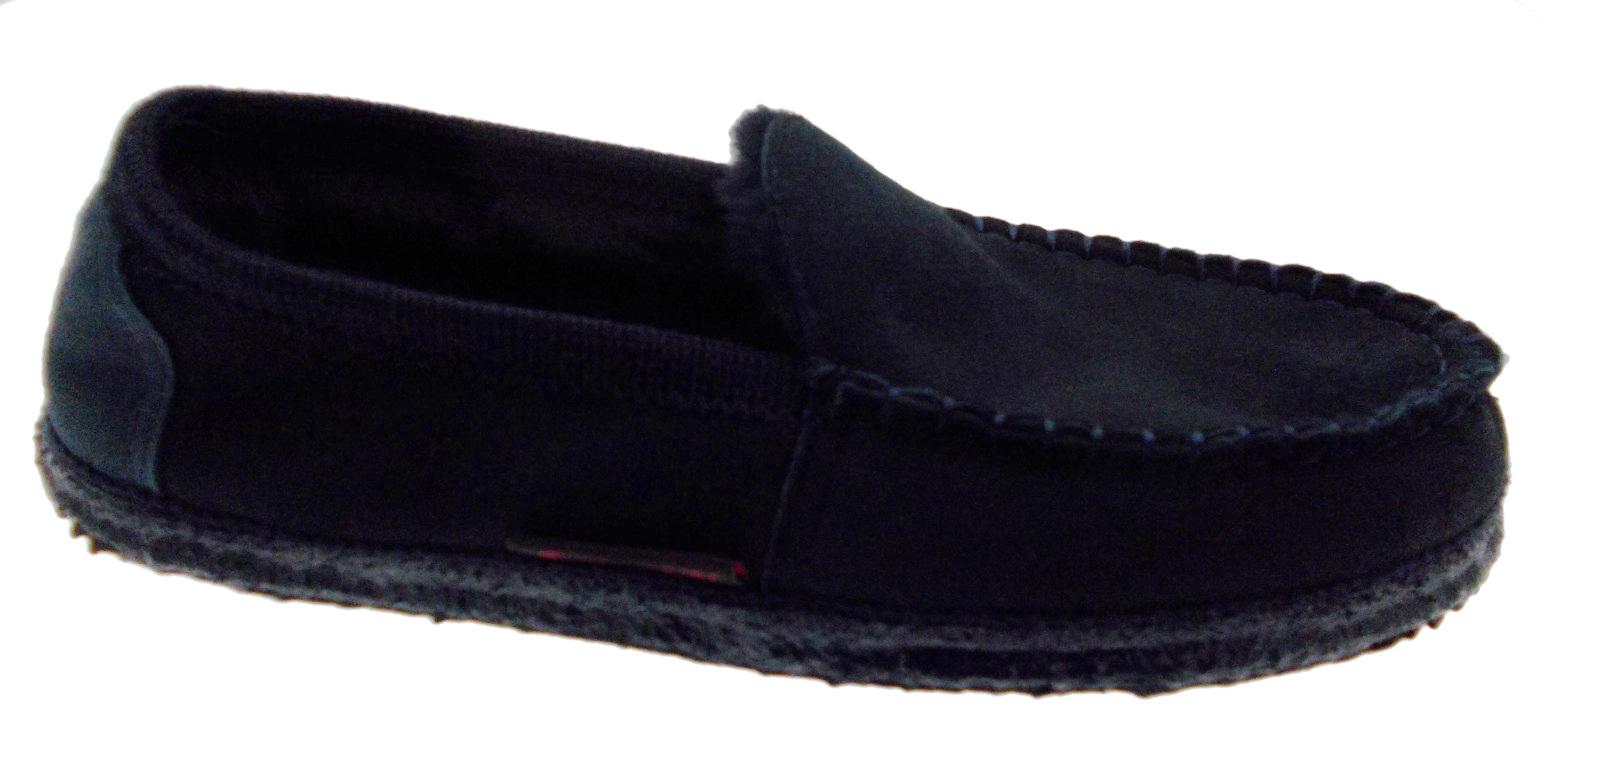 Mutzel scuro Pantofola 10 66 Giesswein Mocassino Blu 588 47129 AFZ4qtnxwa